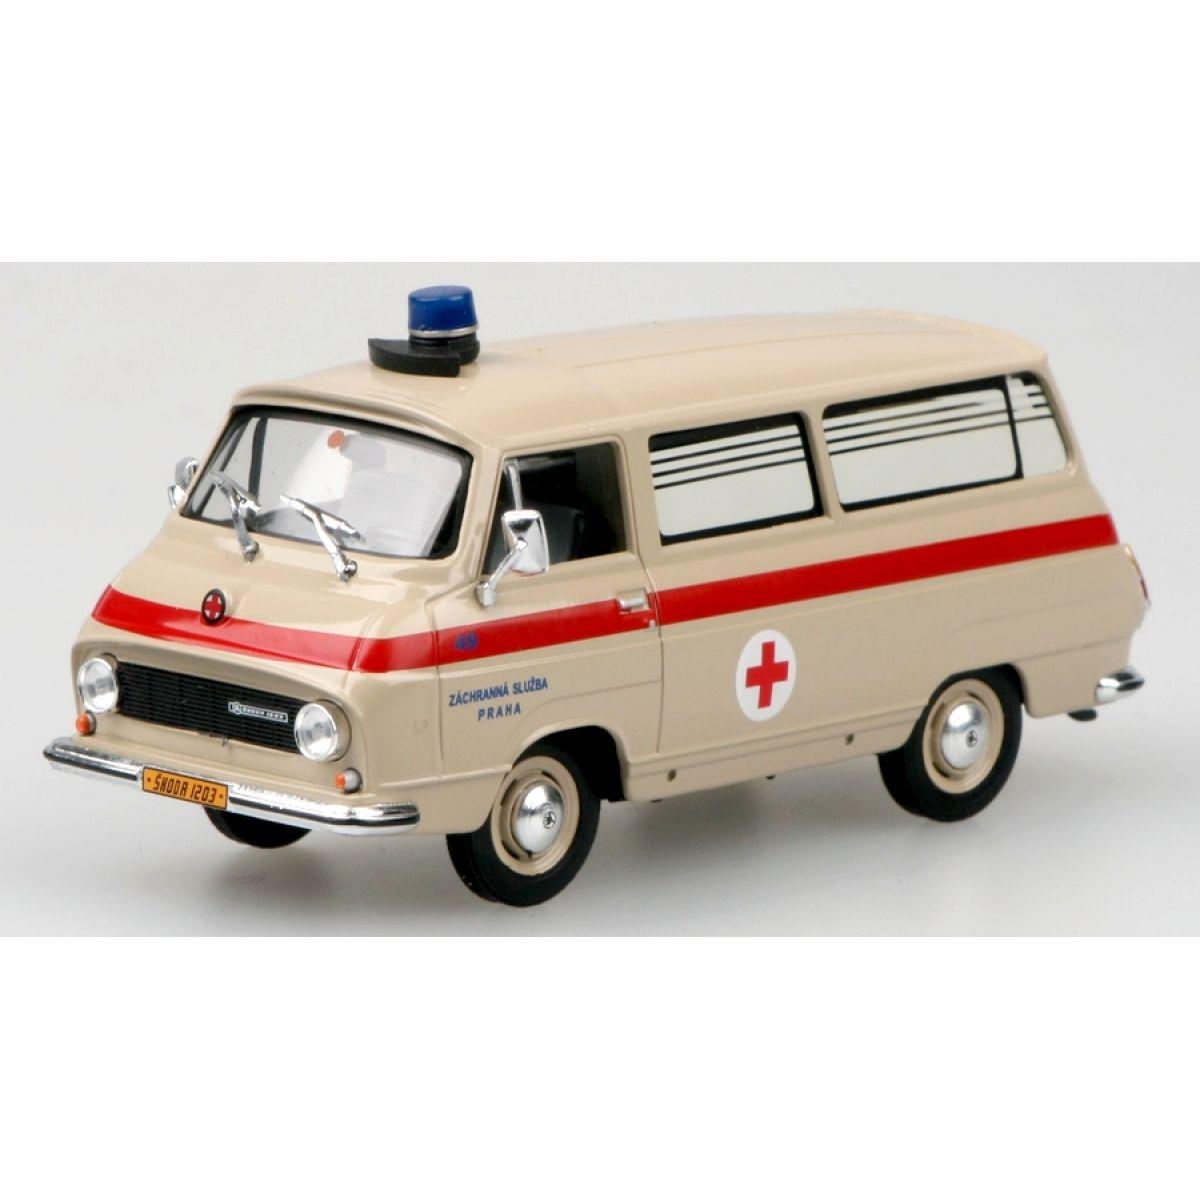 Škoda 1203 Ambulance